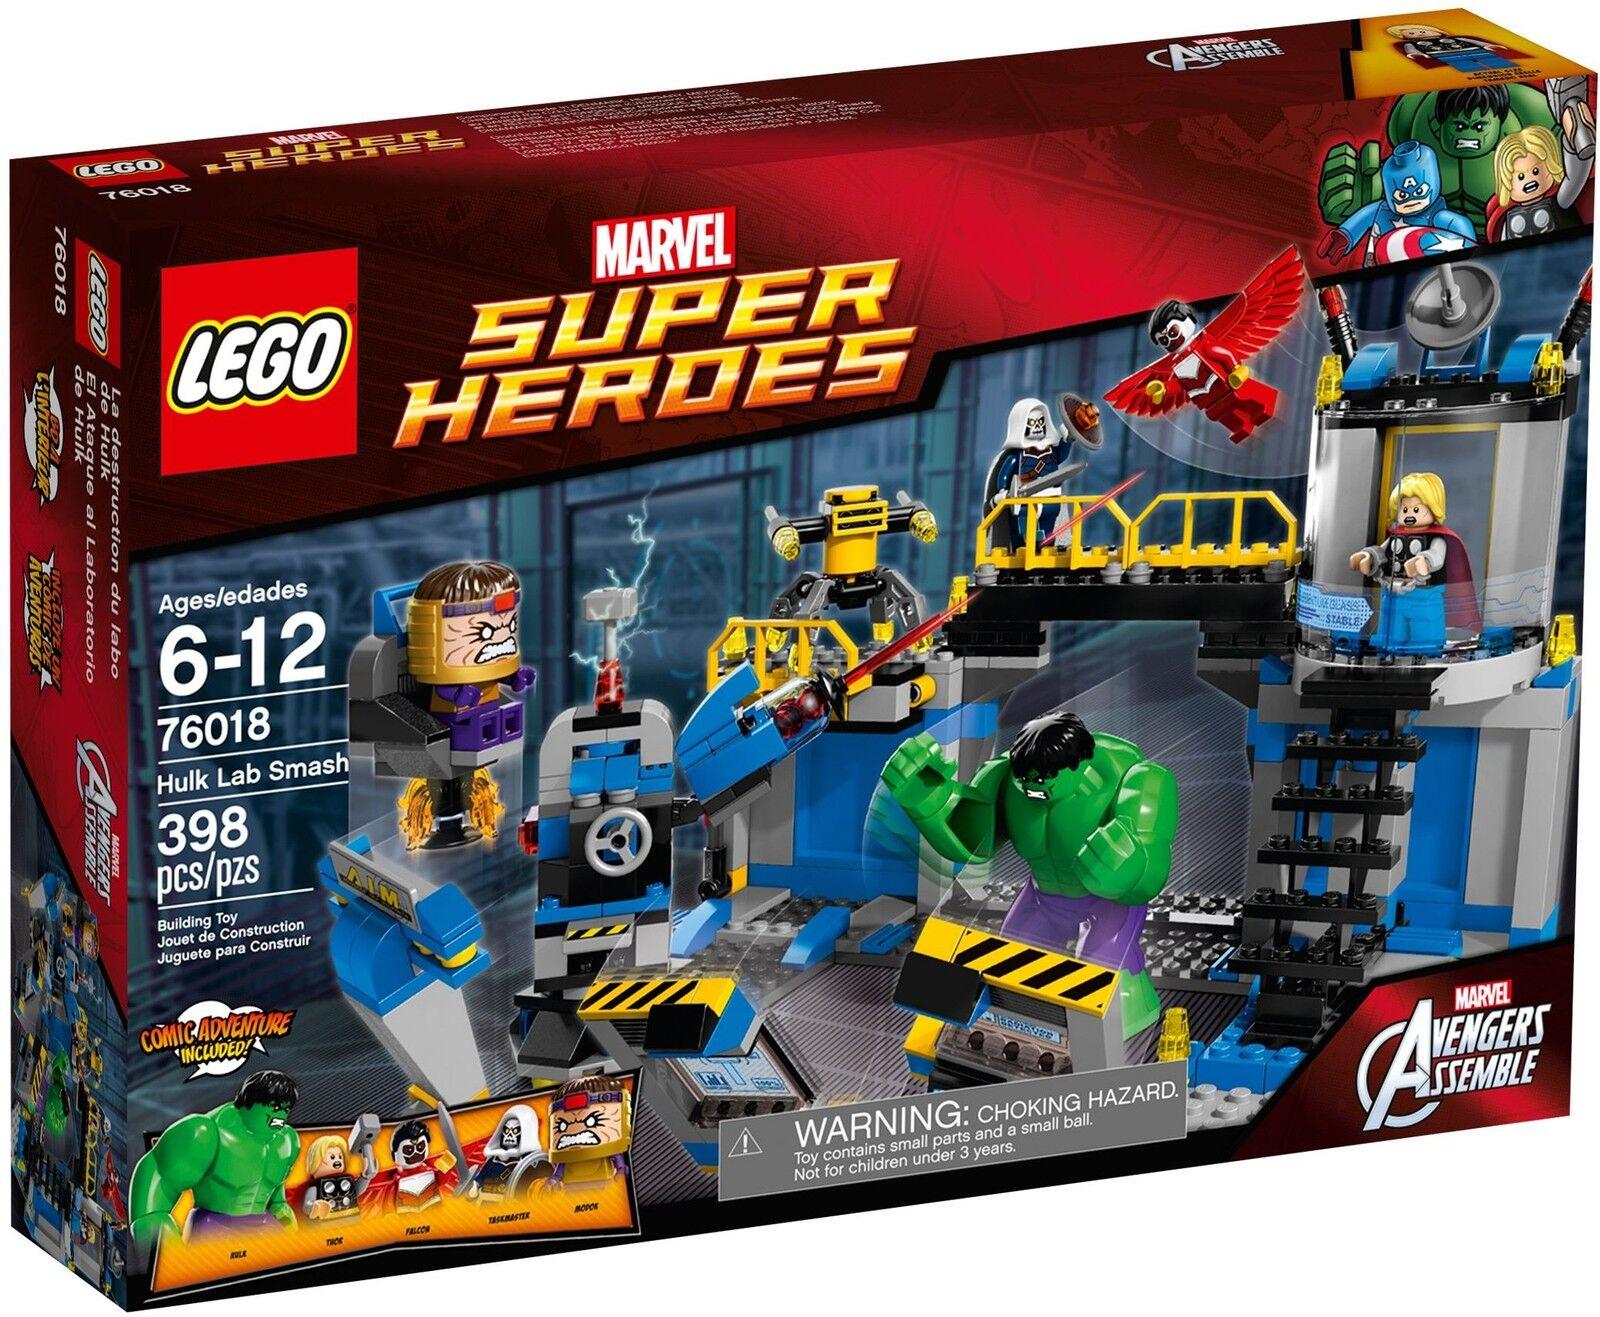 Lego Heroes 76018 Labor Marvel Hulks Smash Super M CBrodxe